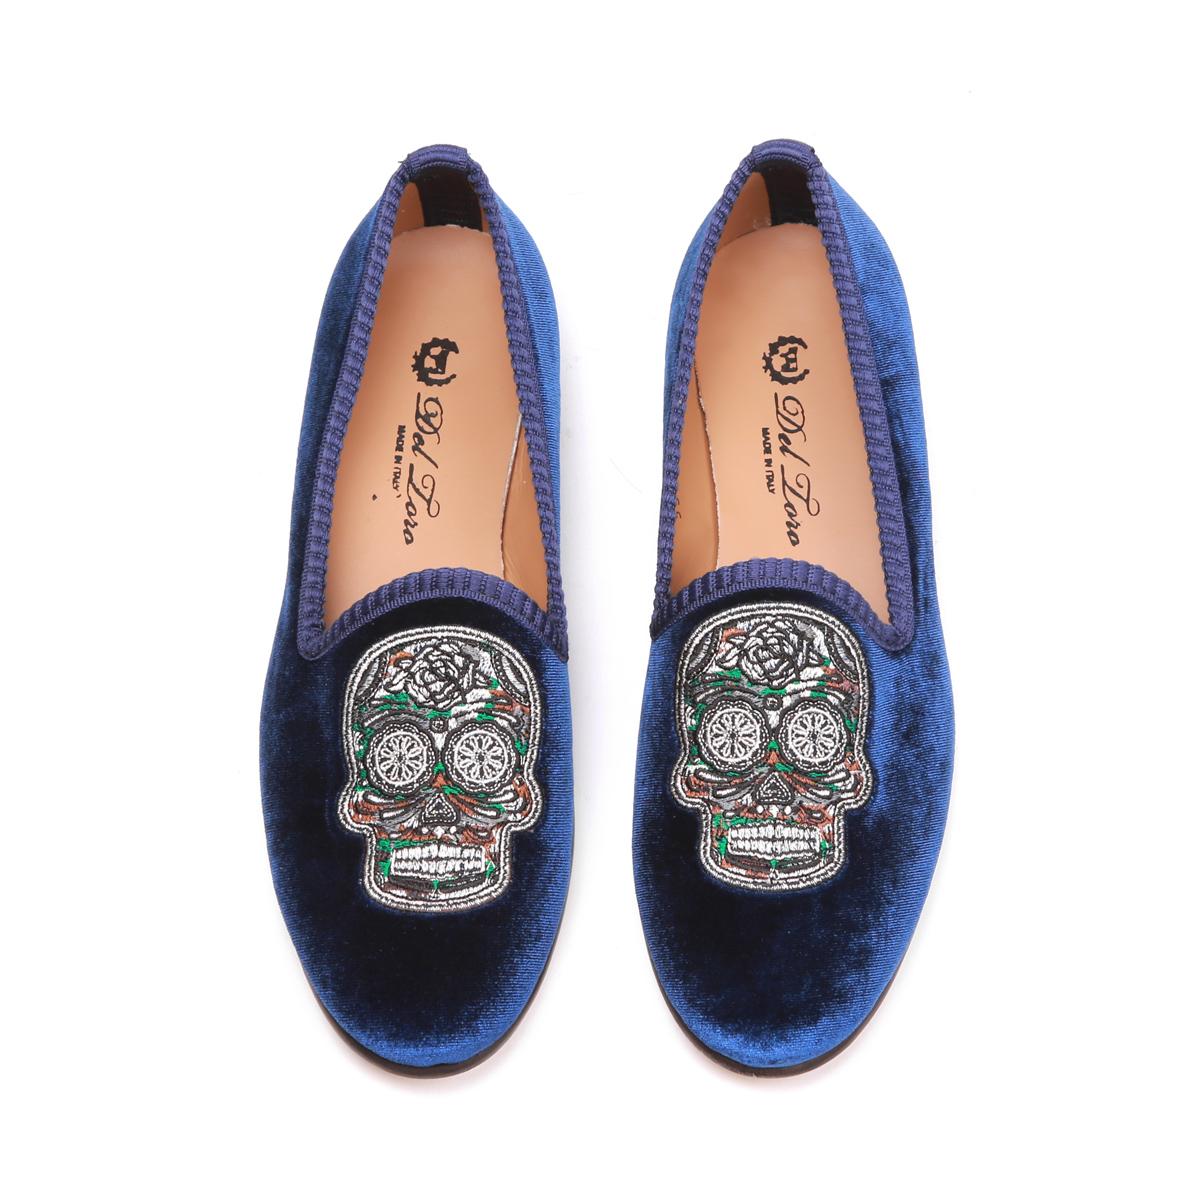 Del Toro slippers.jpg